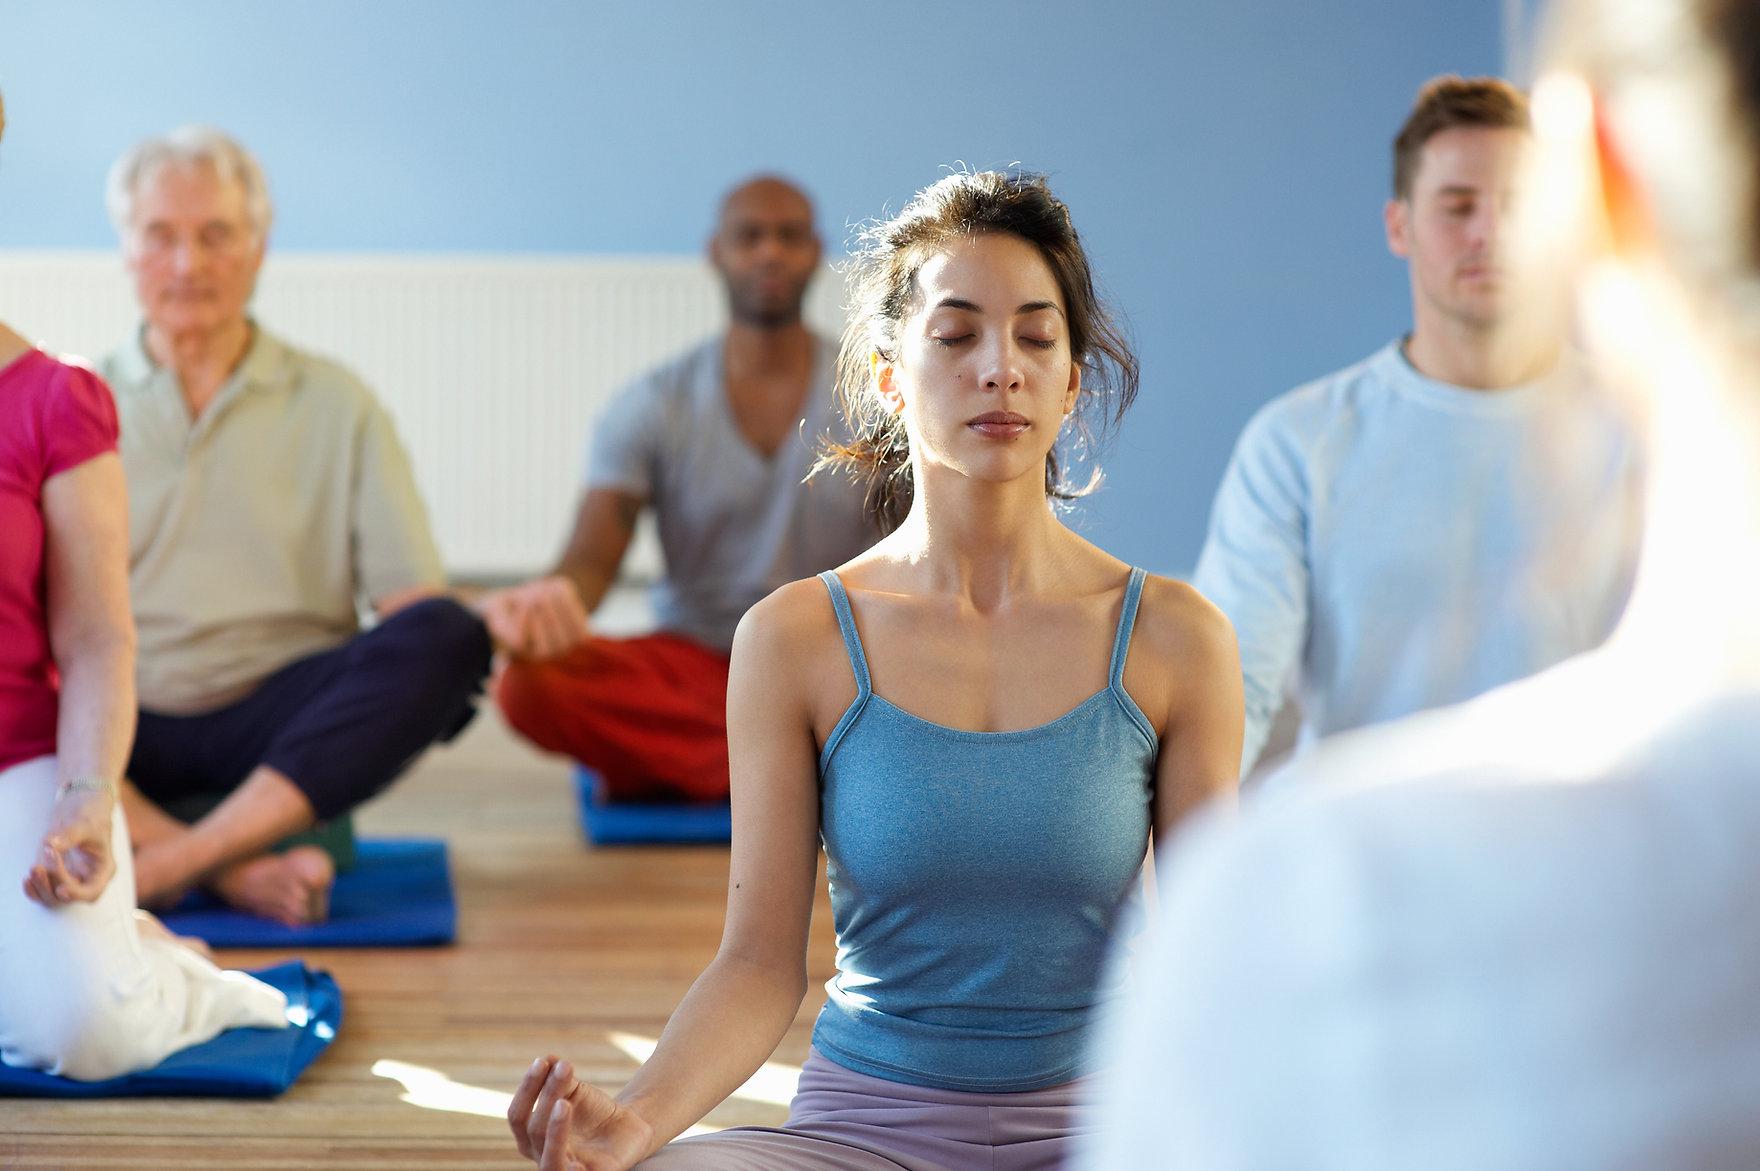 valerie schraauwers bien-être feminin meditation